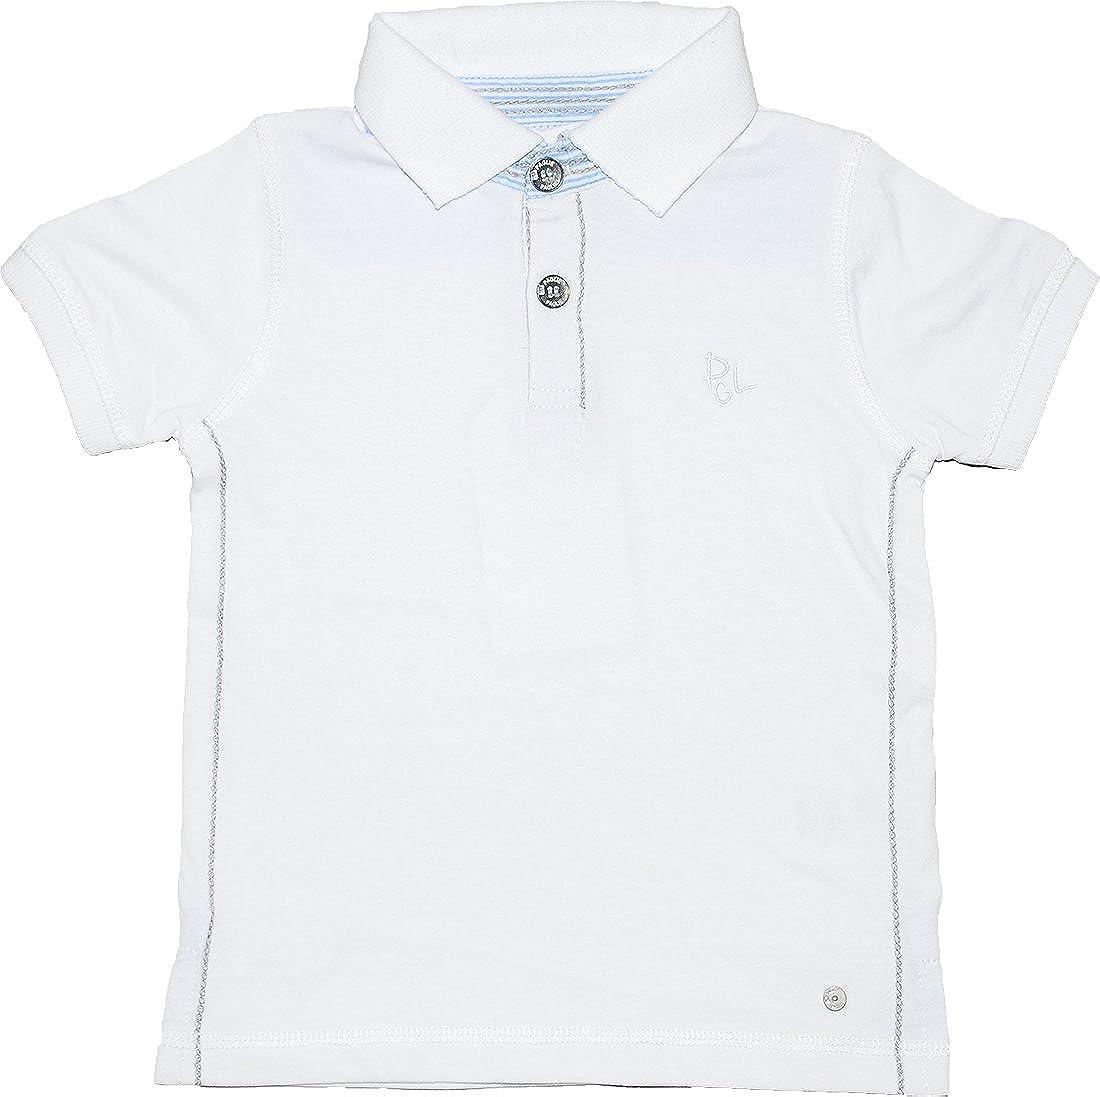 Paglie Baby Jungen Polo-Shirt Kurzarmshirt Weiß Festlich MB4-356 W-MB4-W17-355